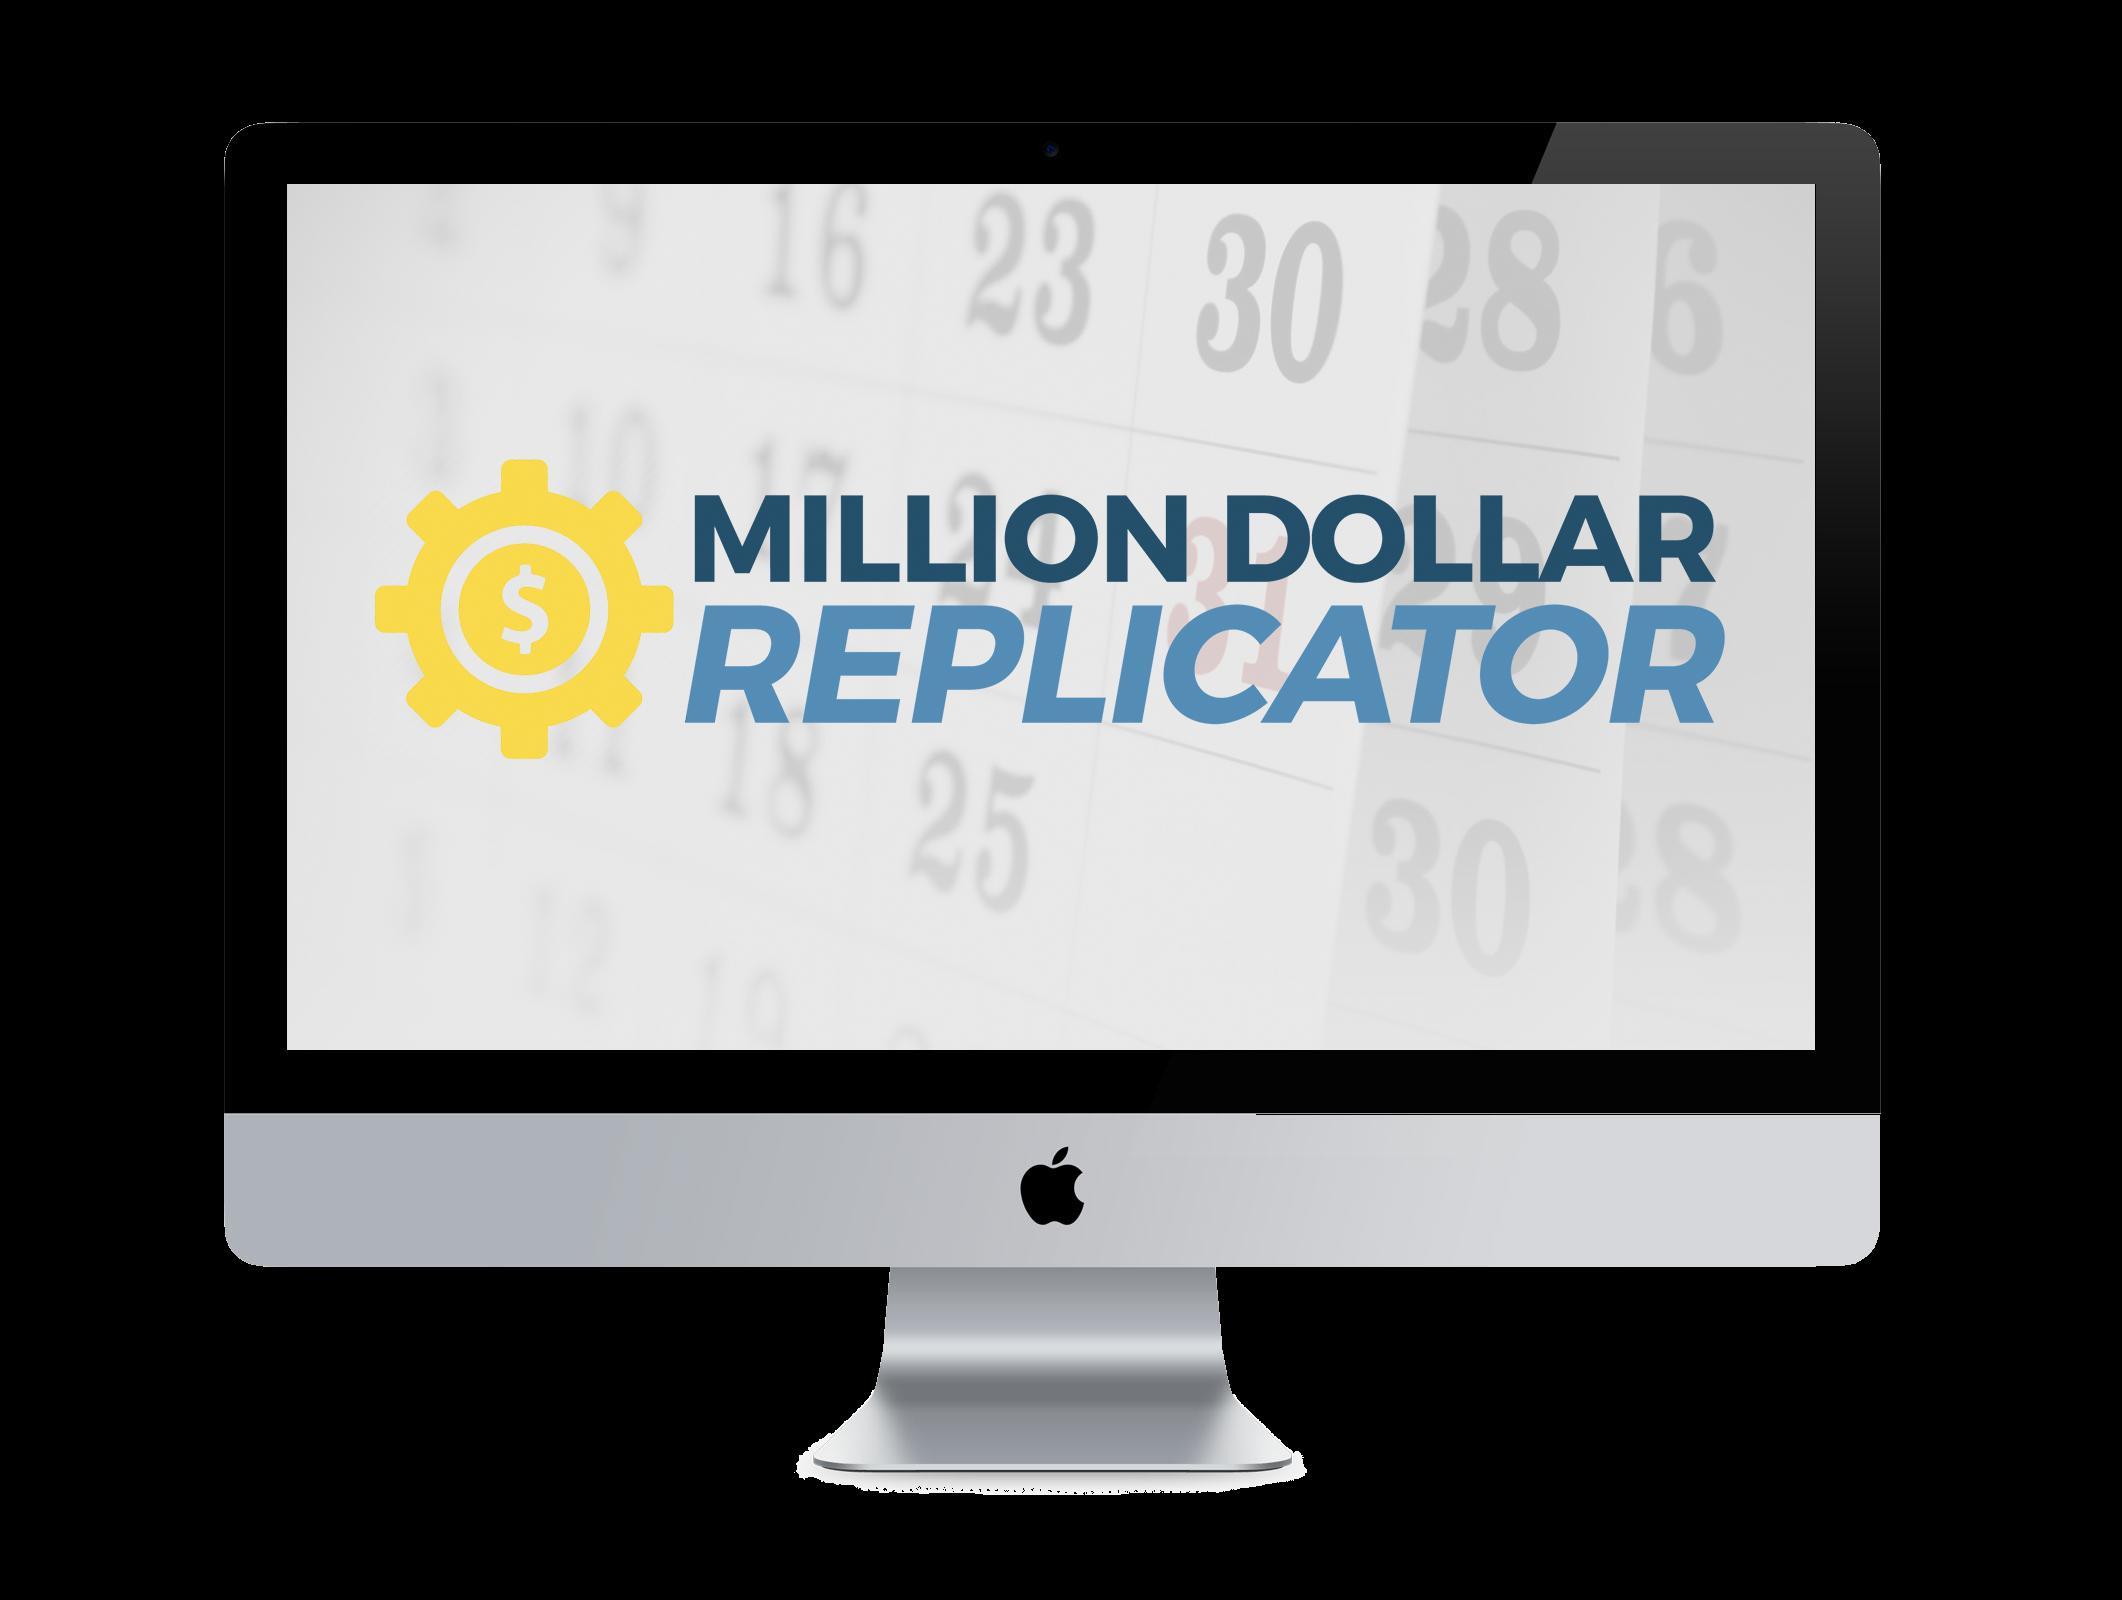 The Million Dollar Replicator